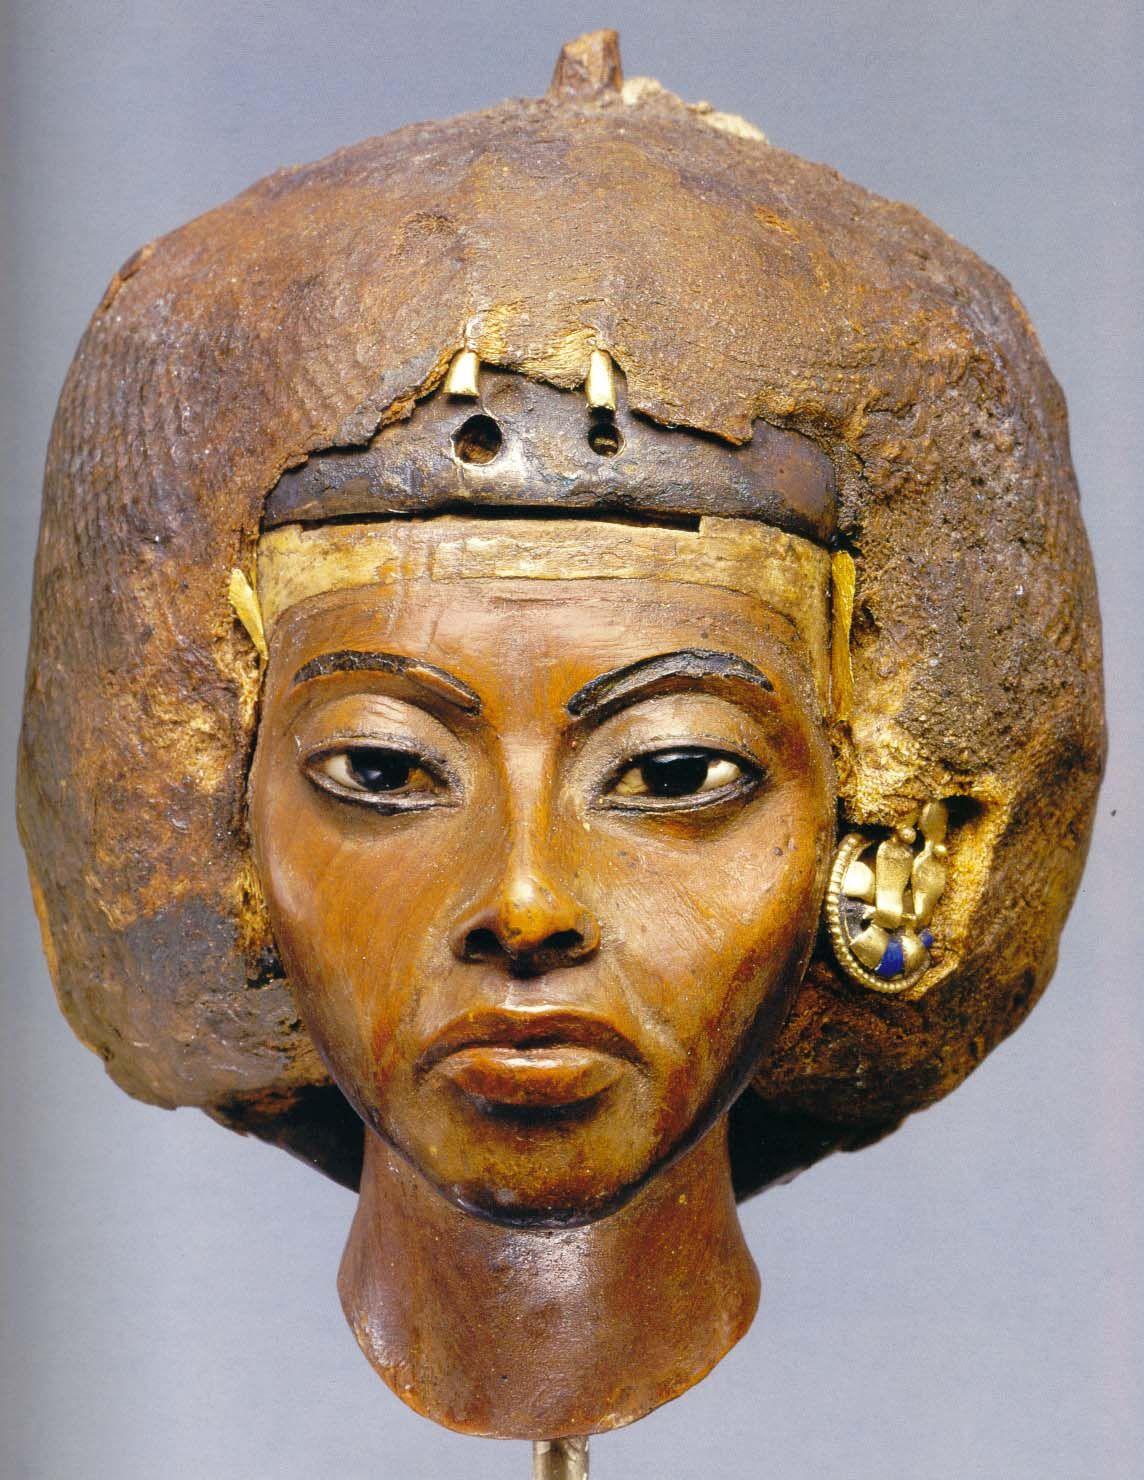 Pin on Ancient Egyptian stuff